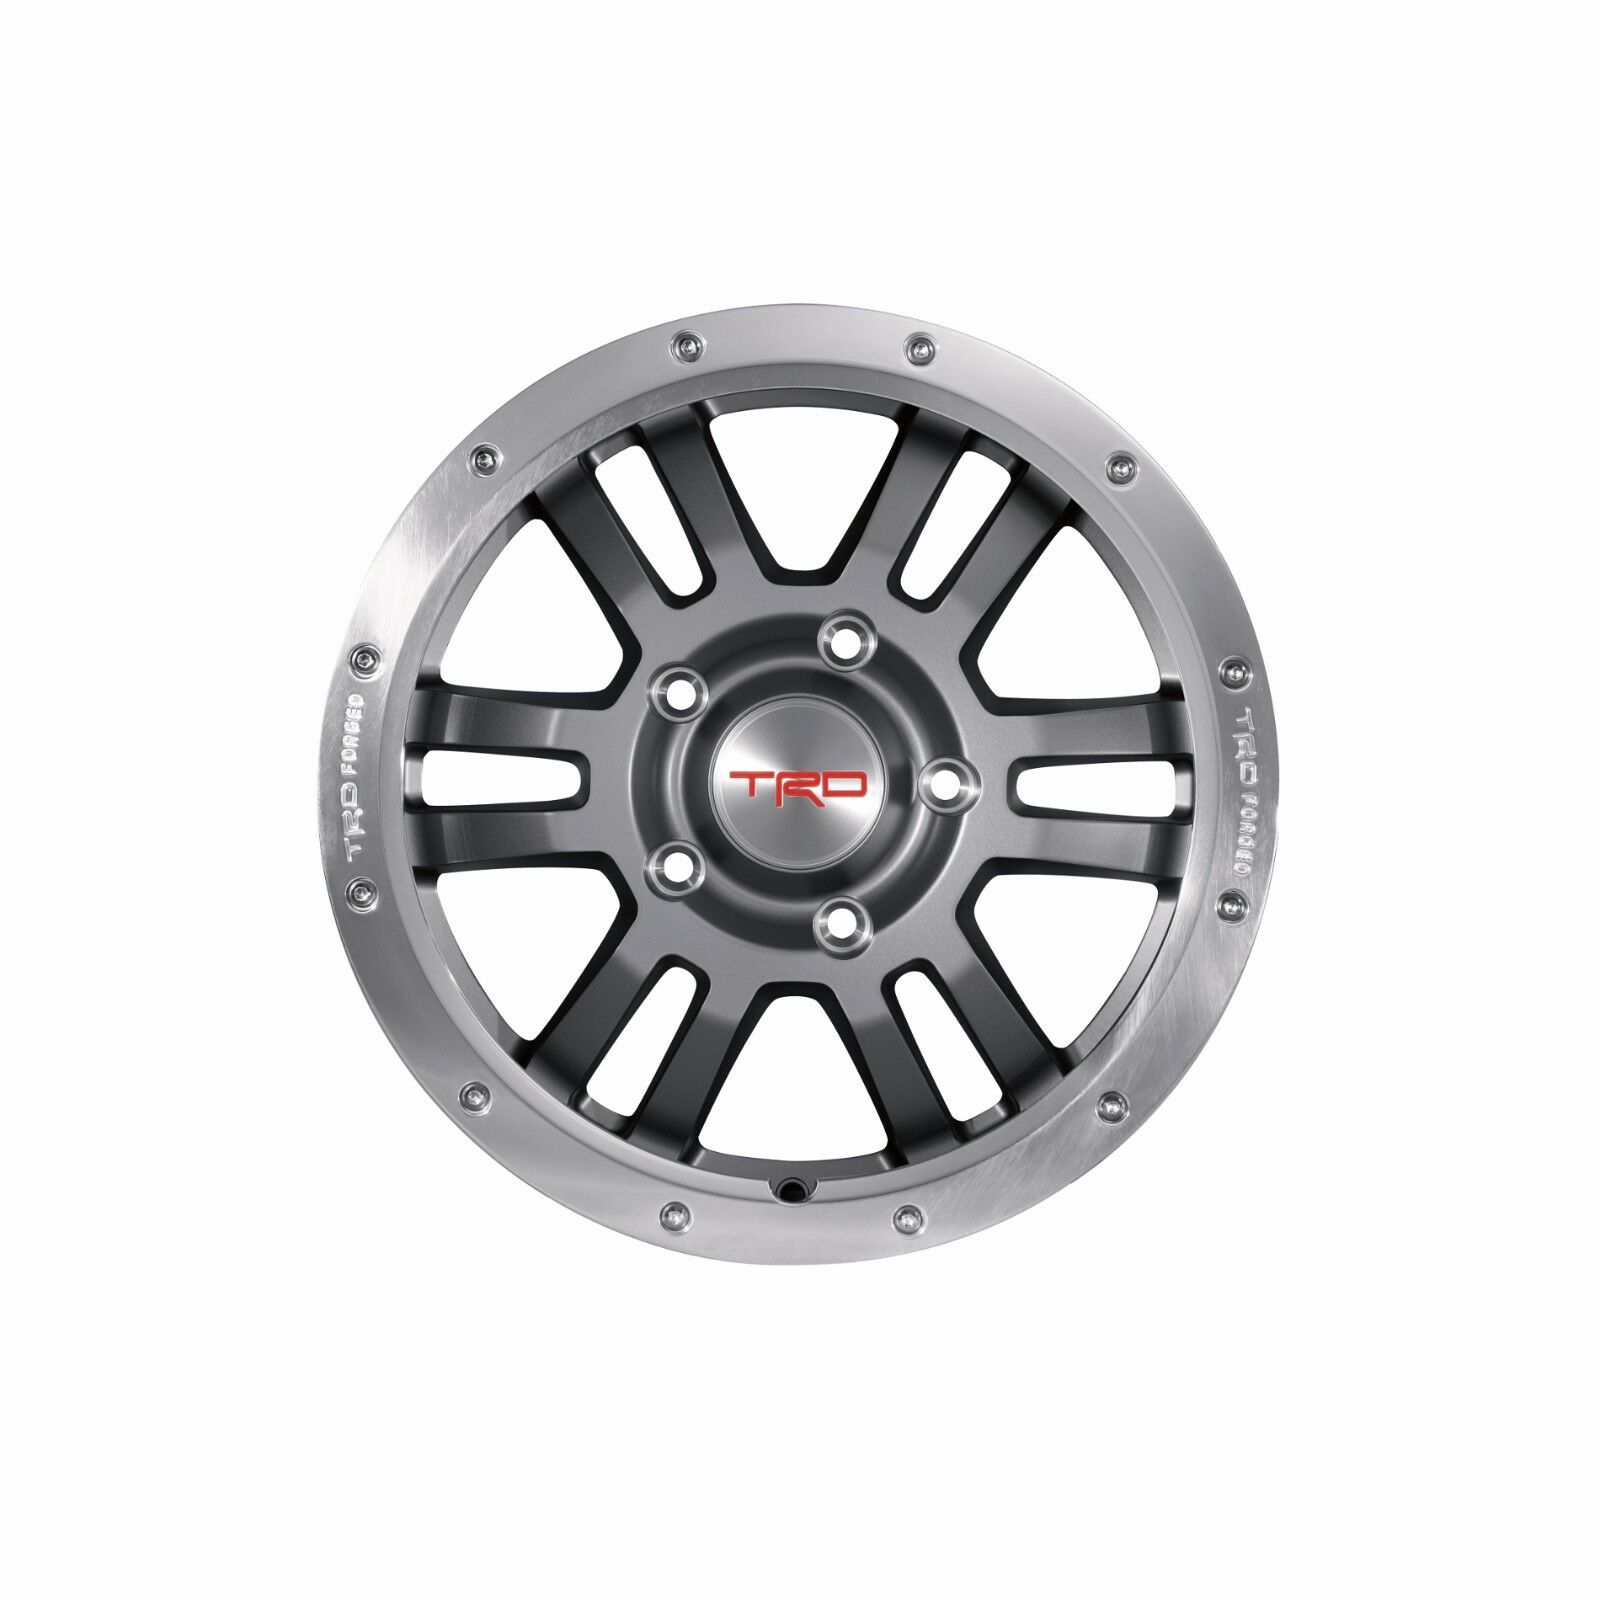 1 Toyota Tundra Trd 17 Rock Warrior Wheel Ptr45 34120 Genuine Oem Landcruiser With 22 Inch Custom Rims Ebay